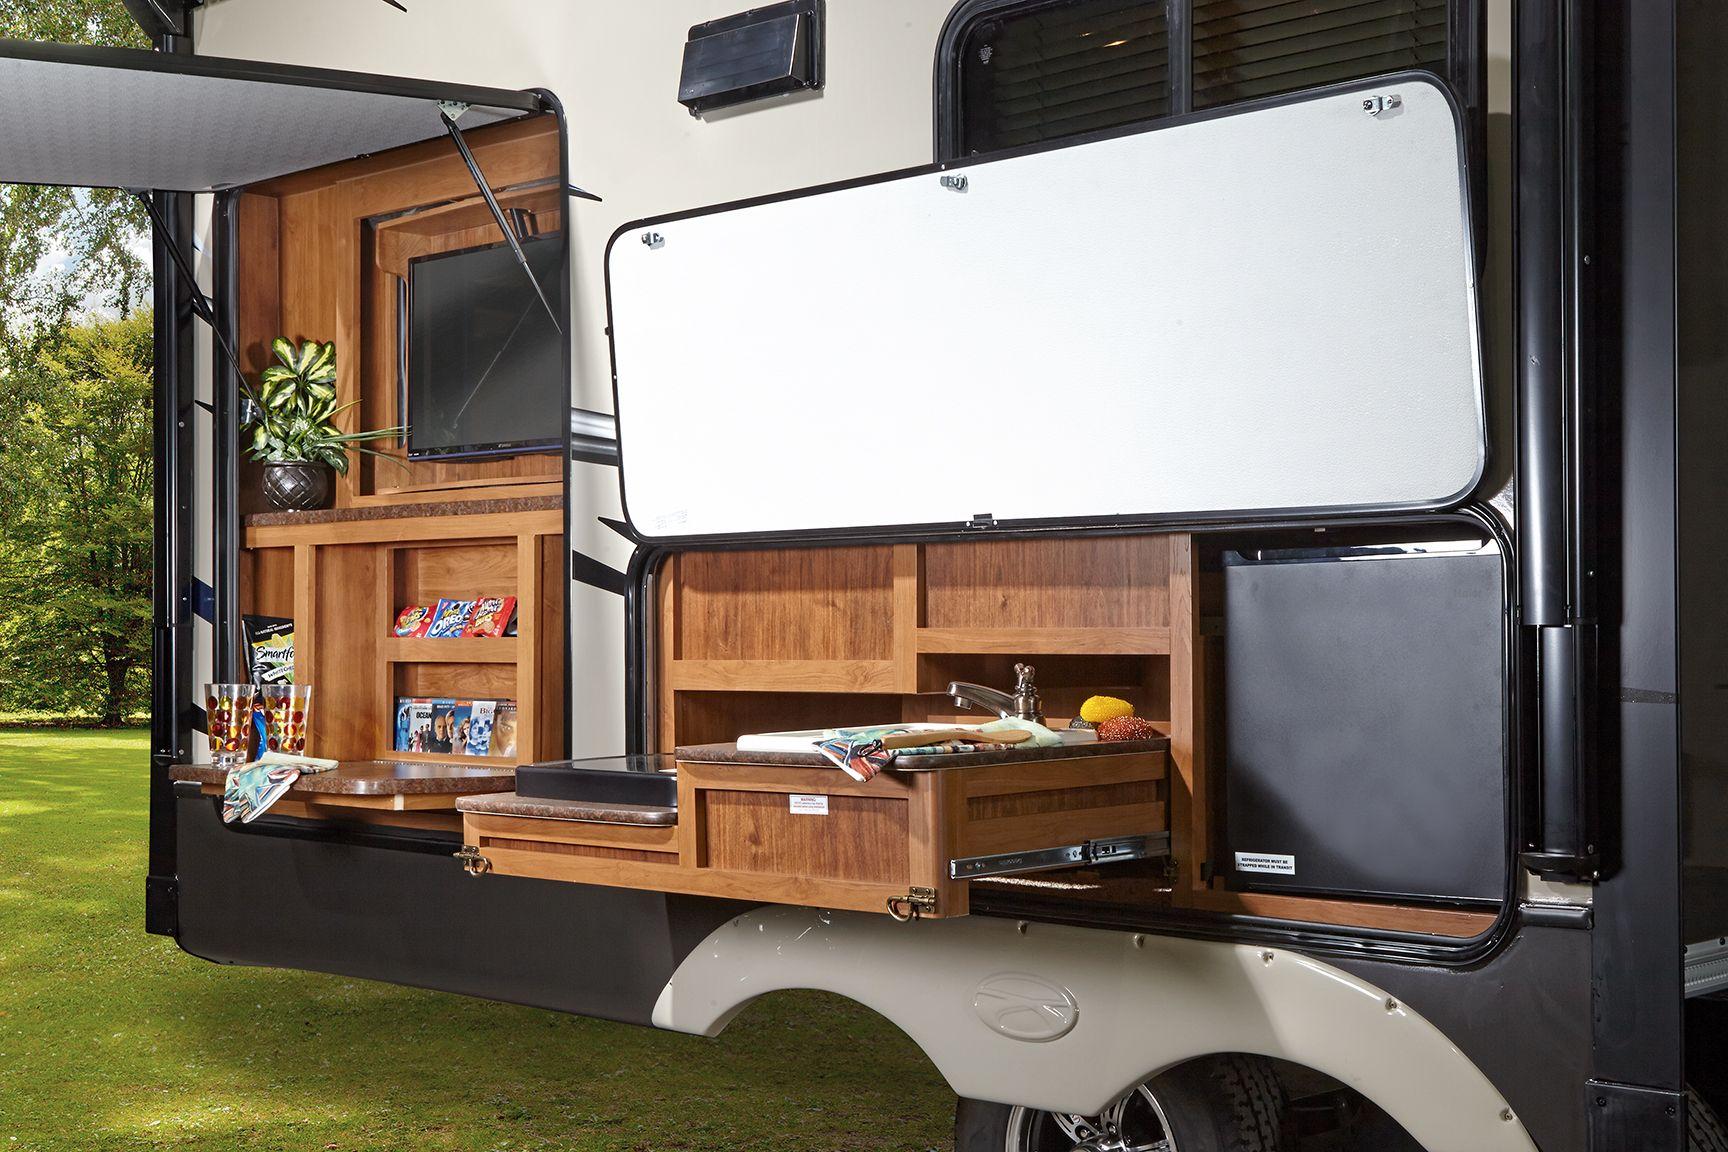 Image result for rv exterior storage ideas | Tiny House Design Ideas on motor coach outdoor kitchen, camper leveling jacks, trailer kitchen, rv kitchen, small camper kitchen,